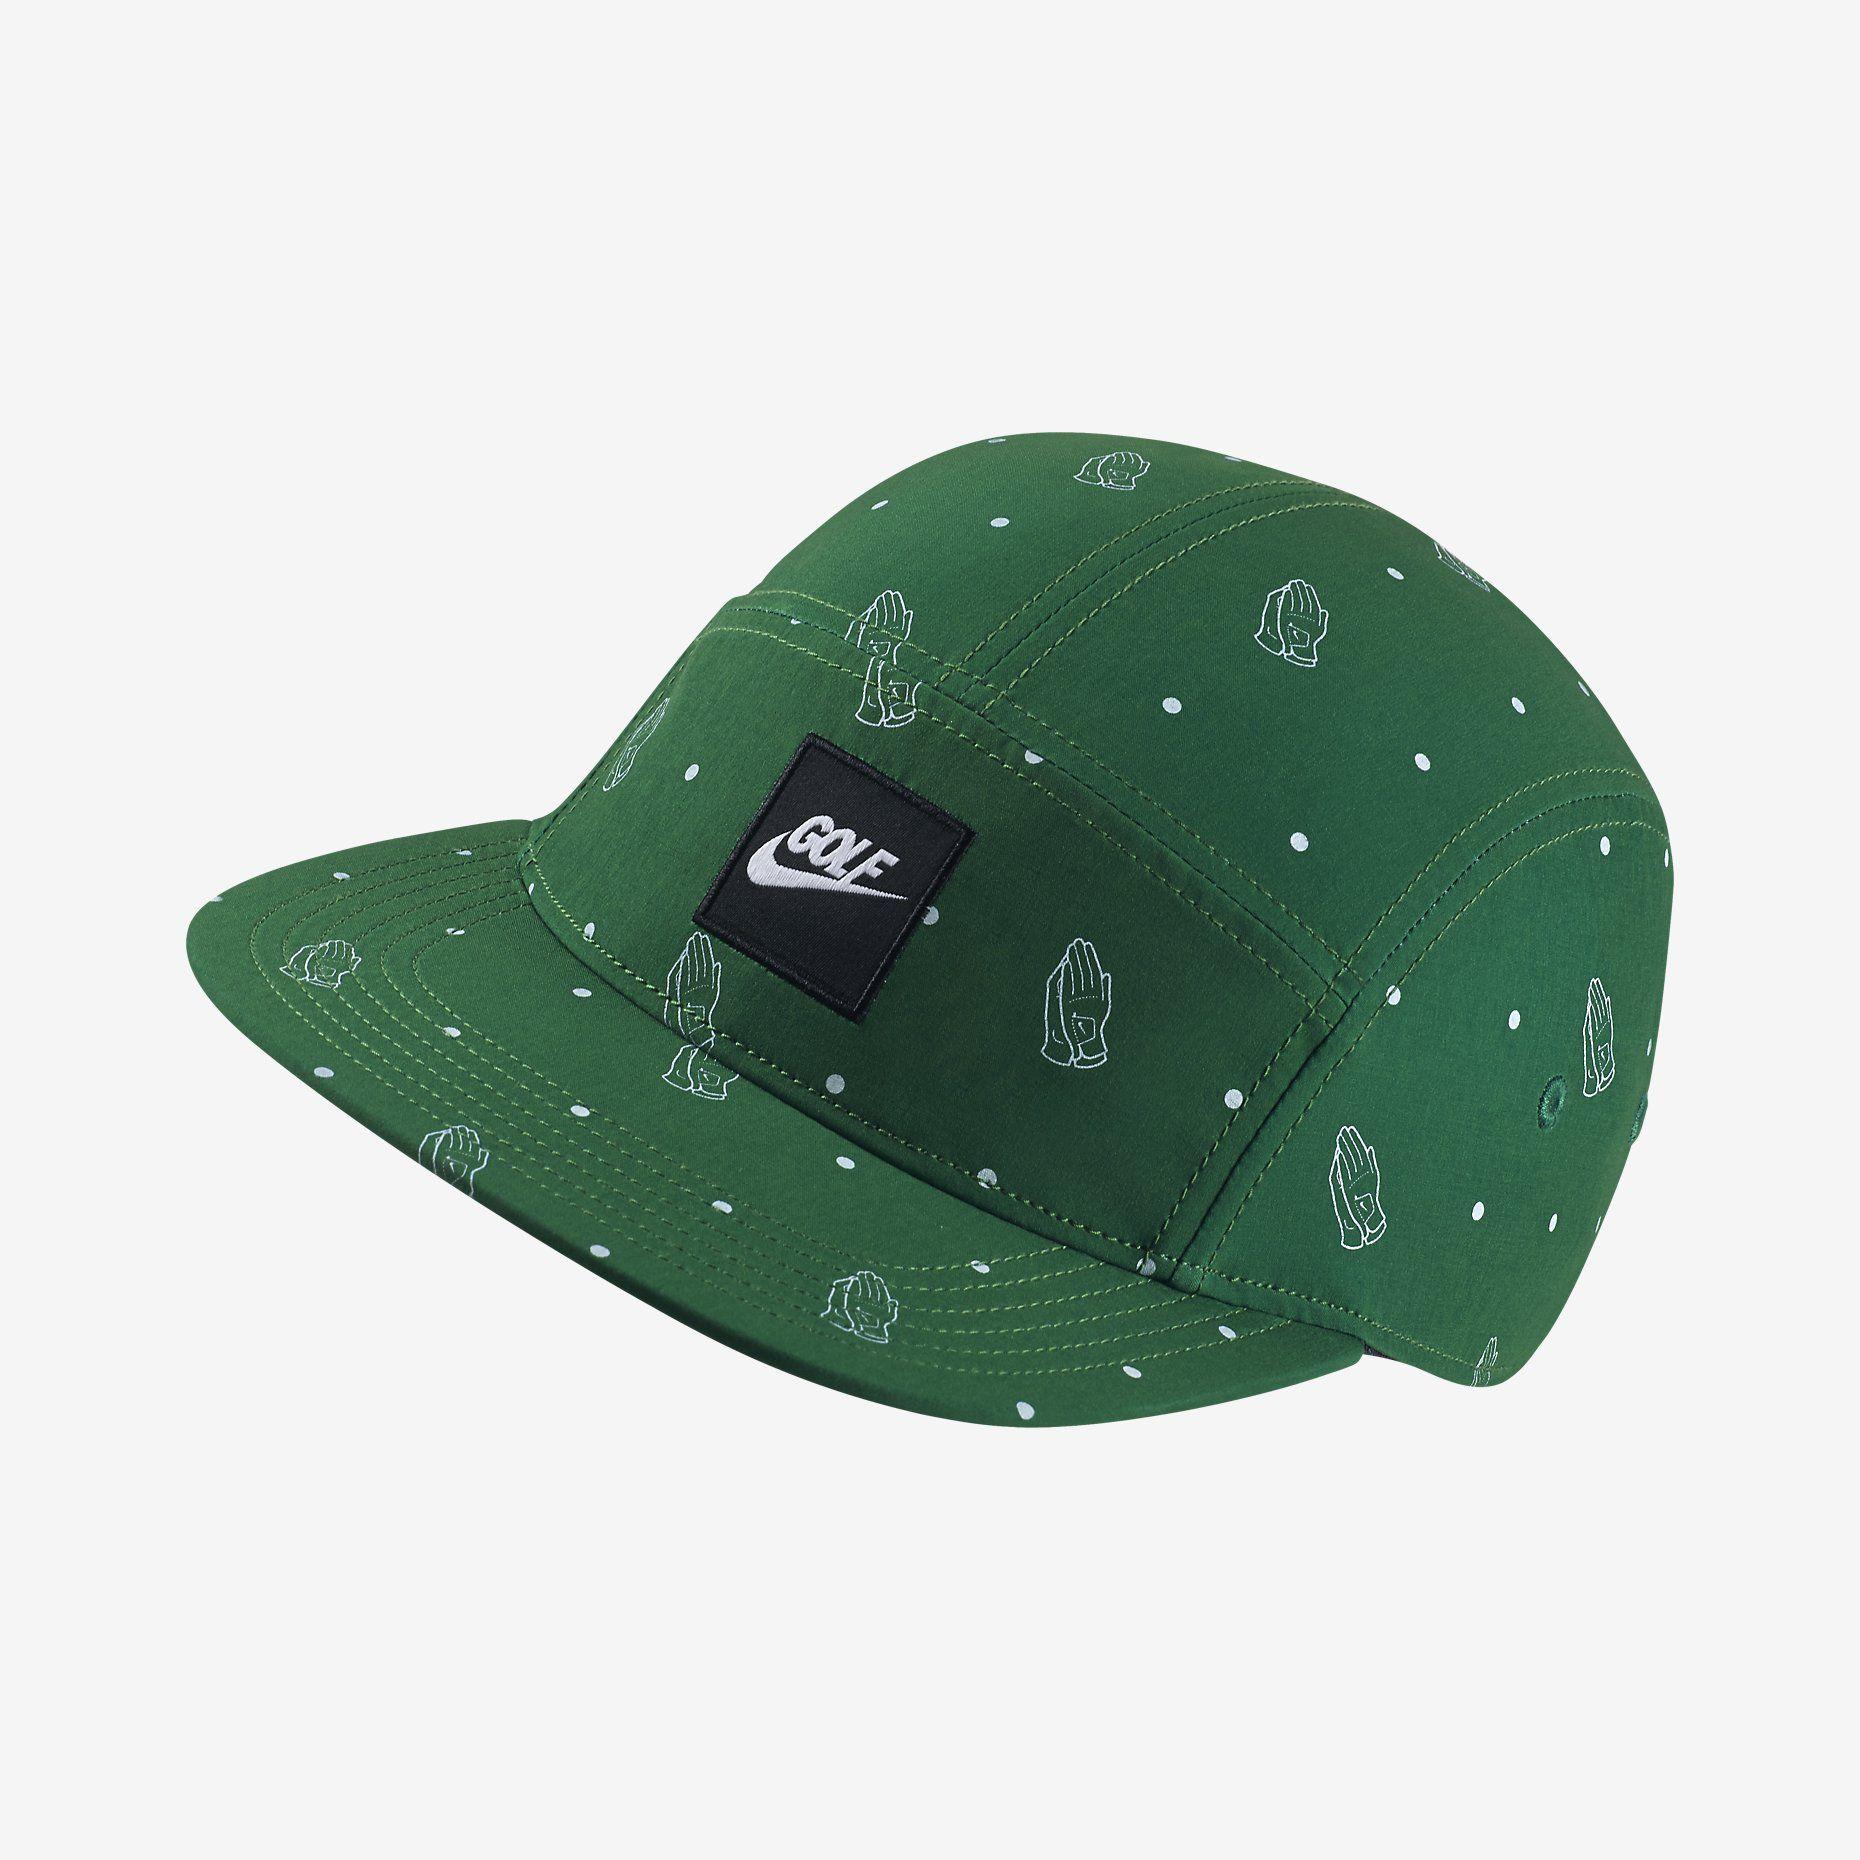 6dc75761117 Nike Golf AW84 Adjustable Hat. Nike Store